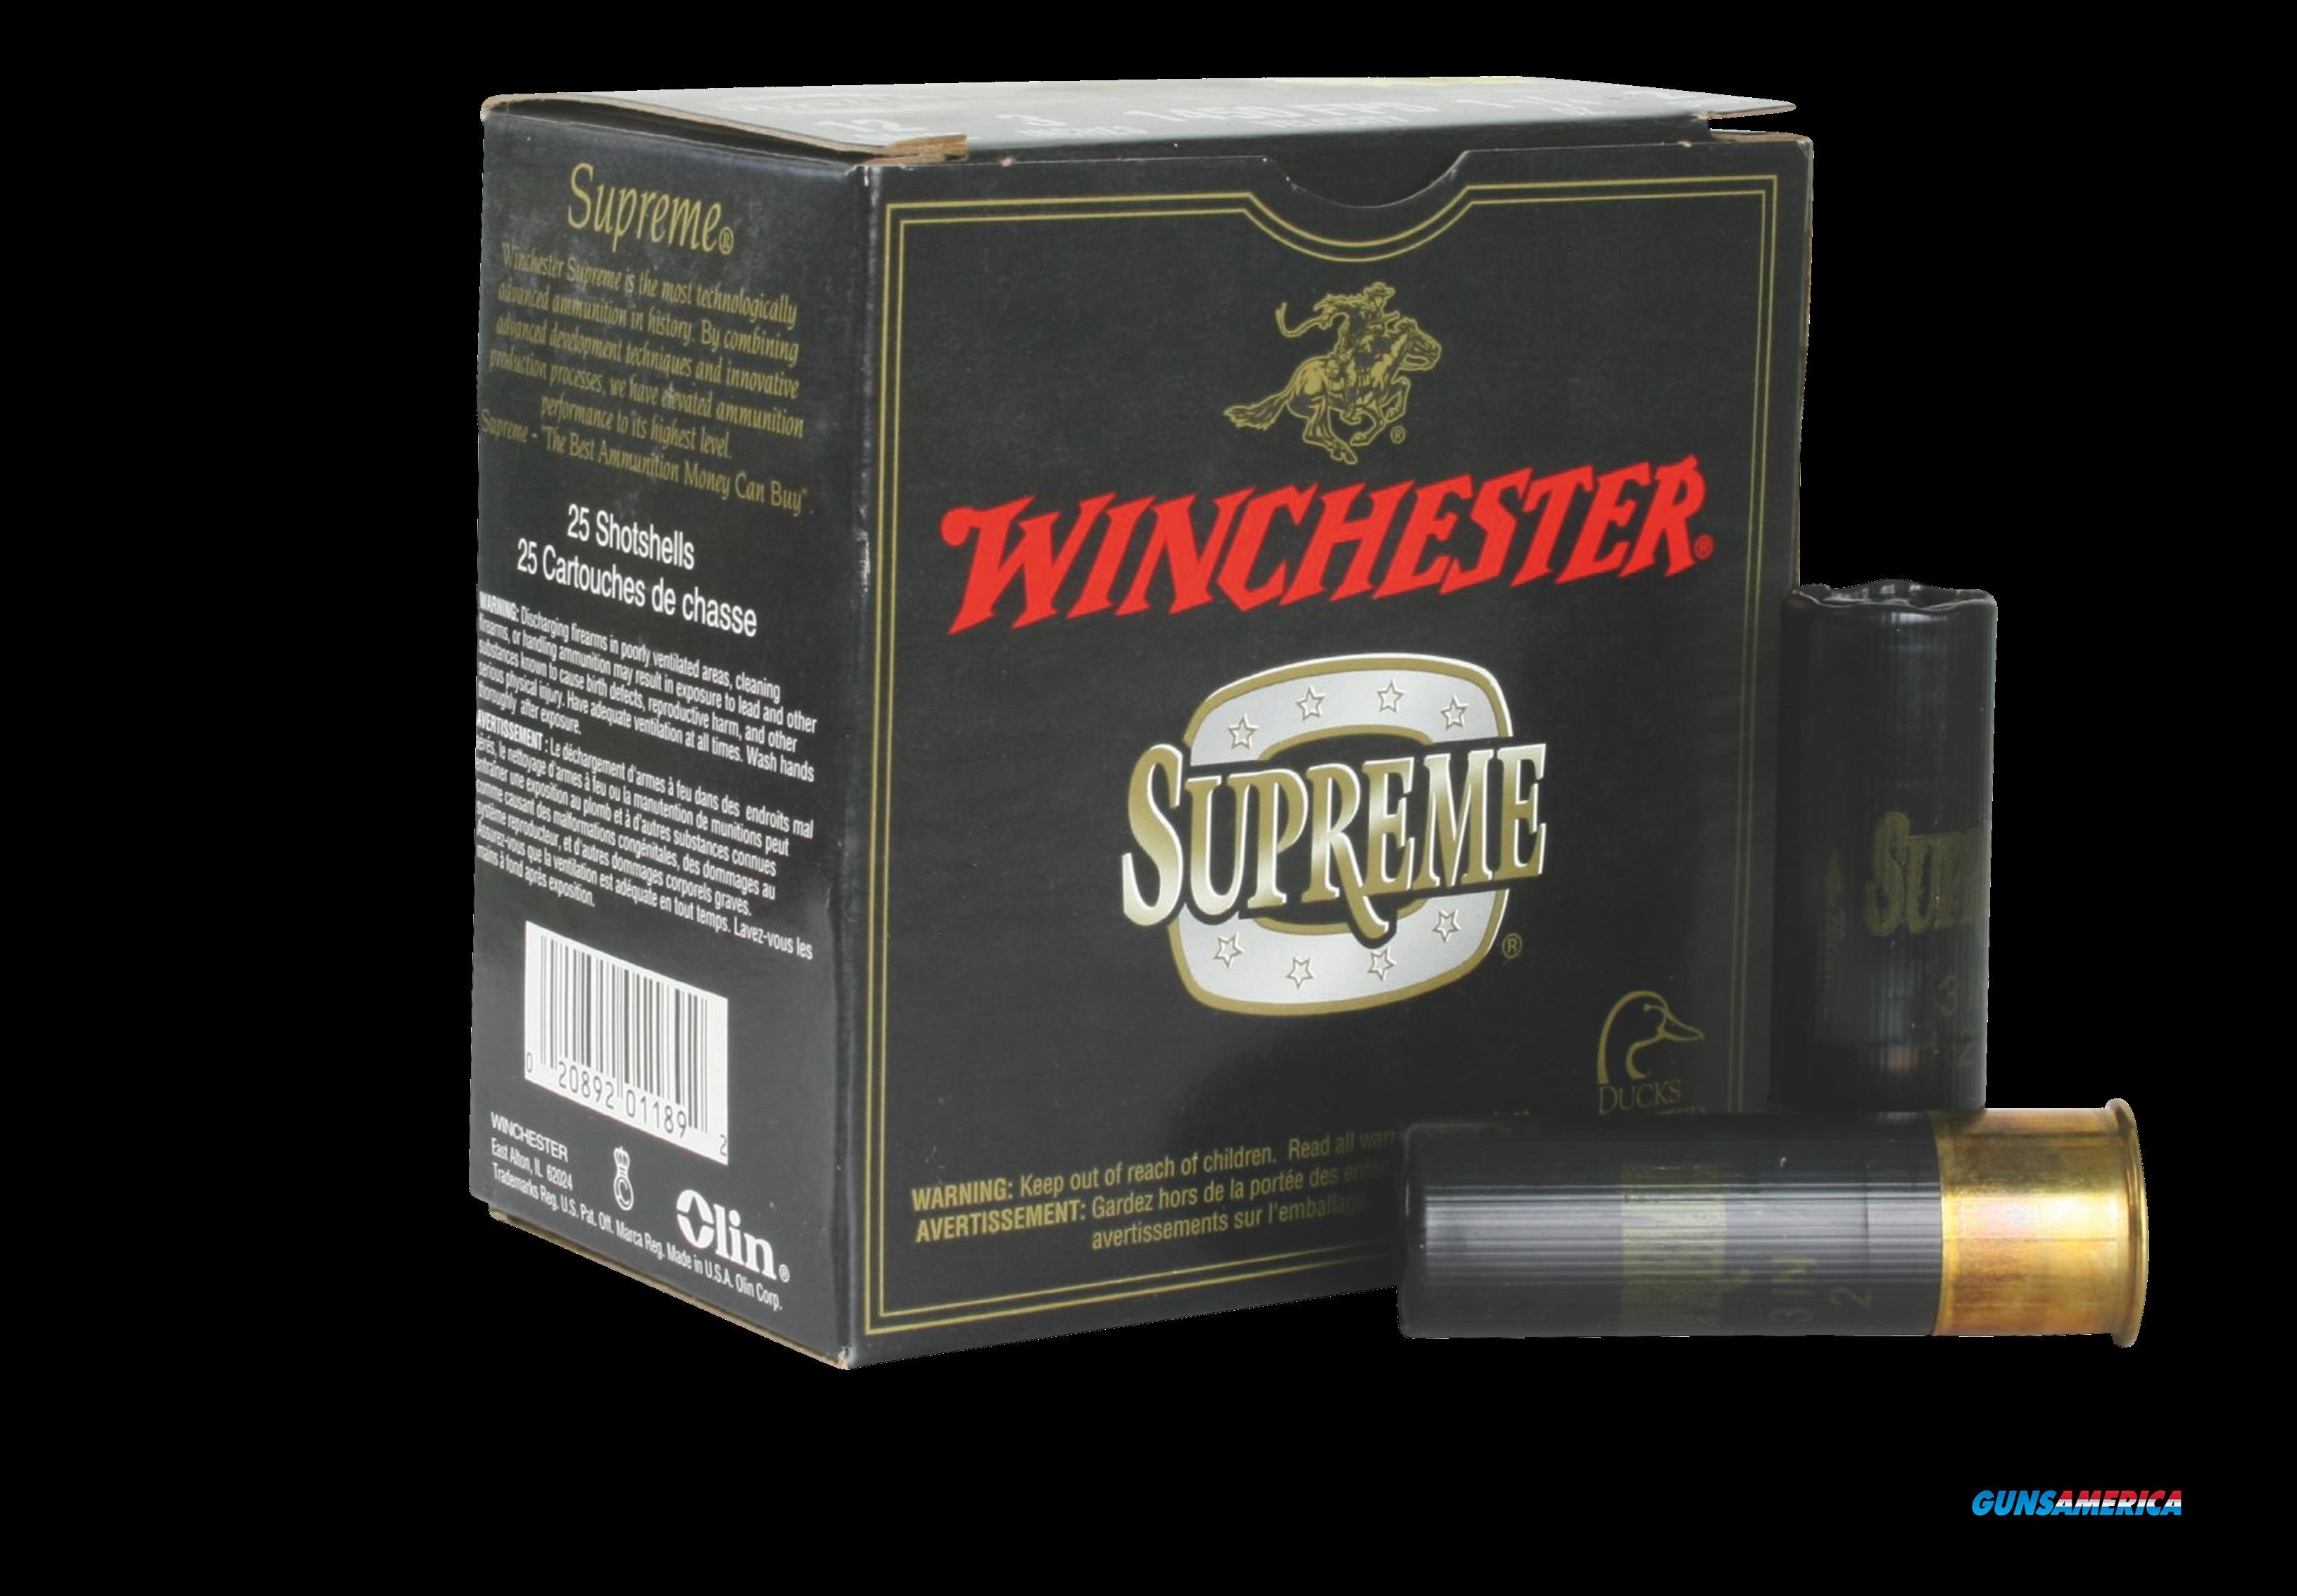 Winchester Ammo Drylock Super Steel, Win Ssh1232    Supreme Hv    Stl  25-10  Guns > Pistols > 1911 Pistol Copies (non-Colt)